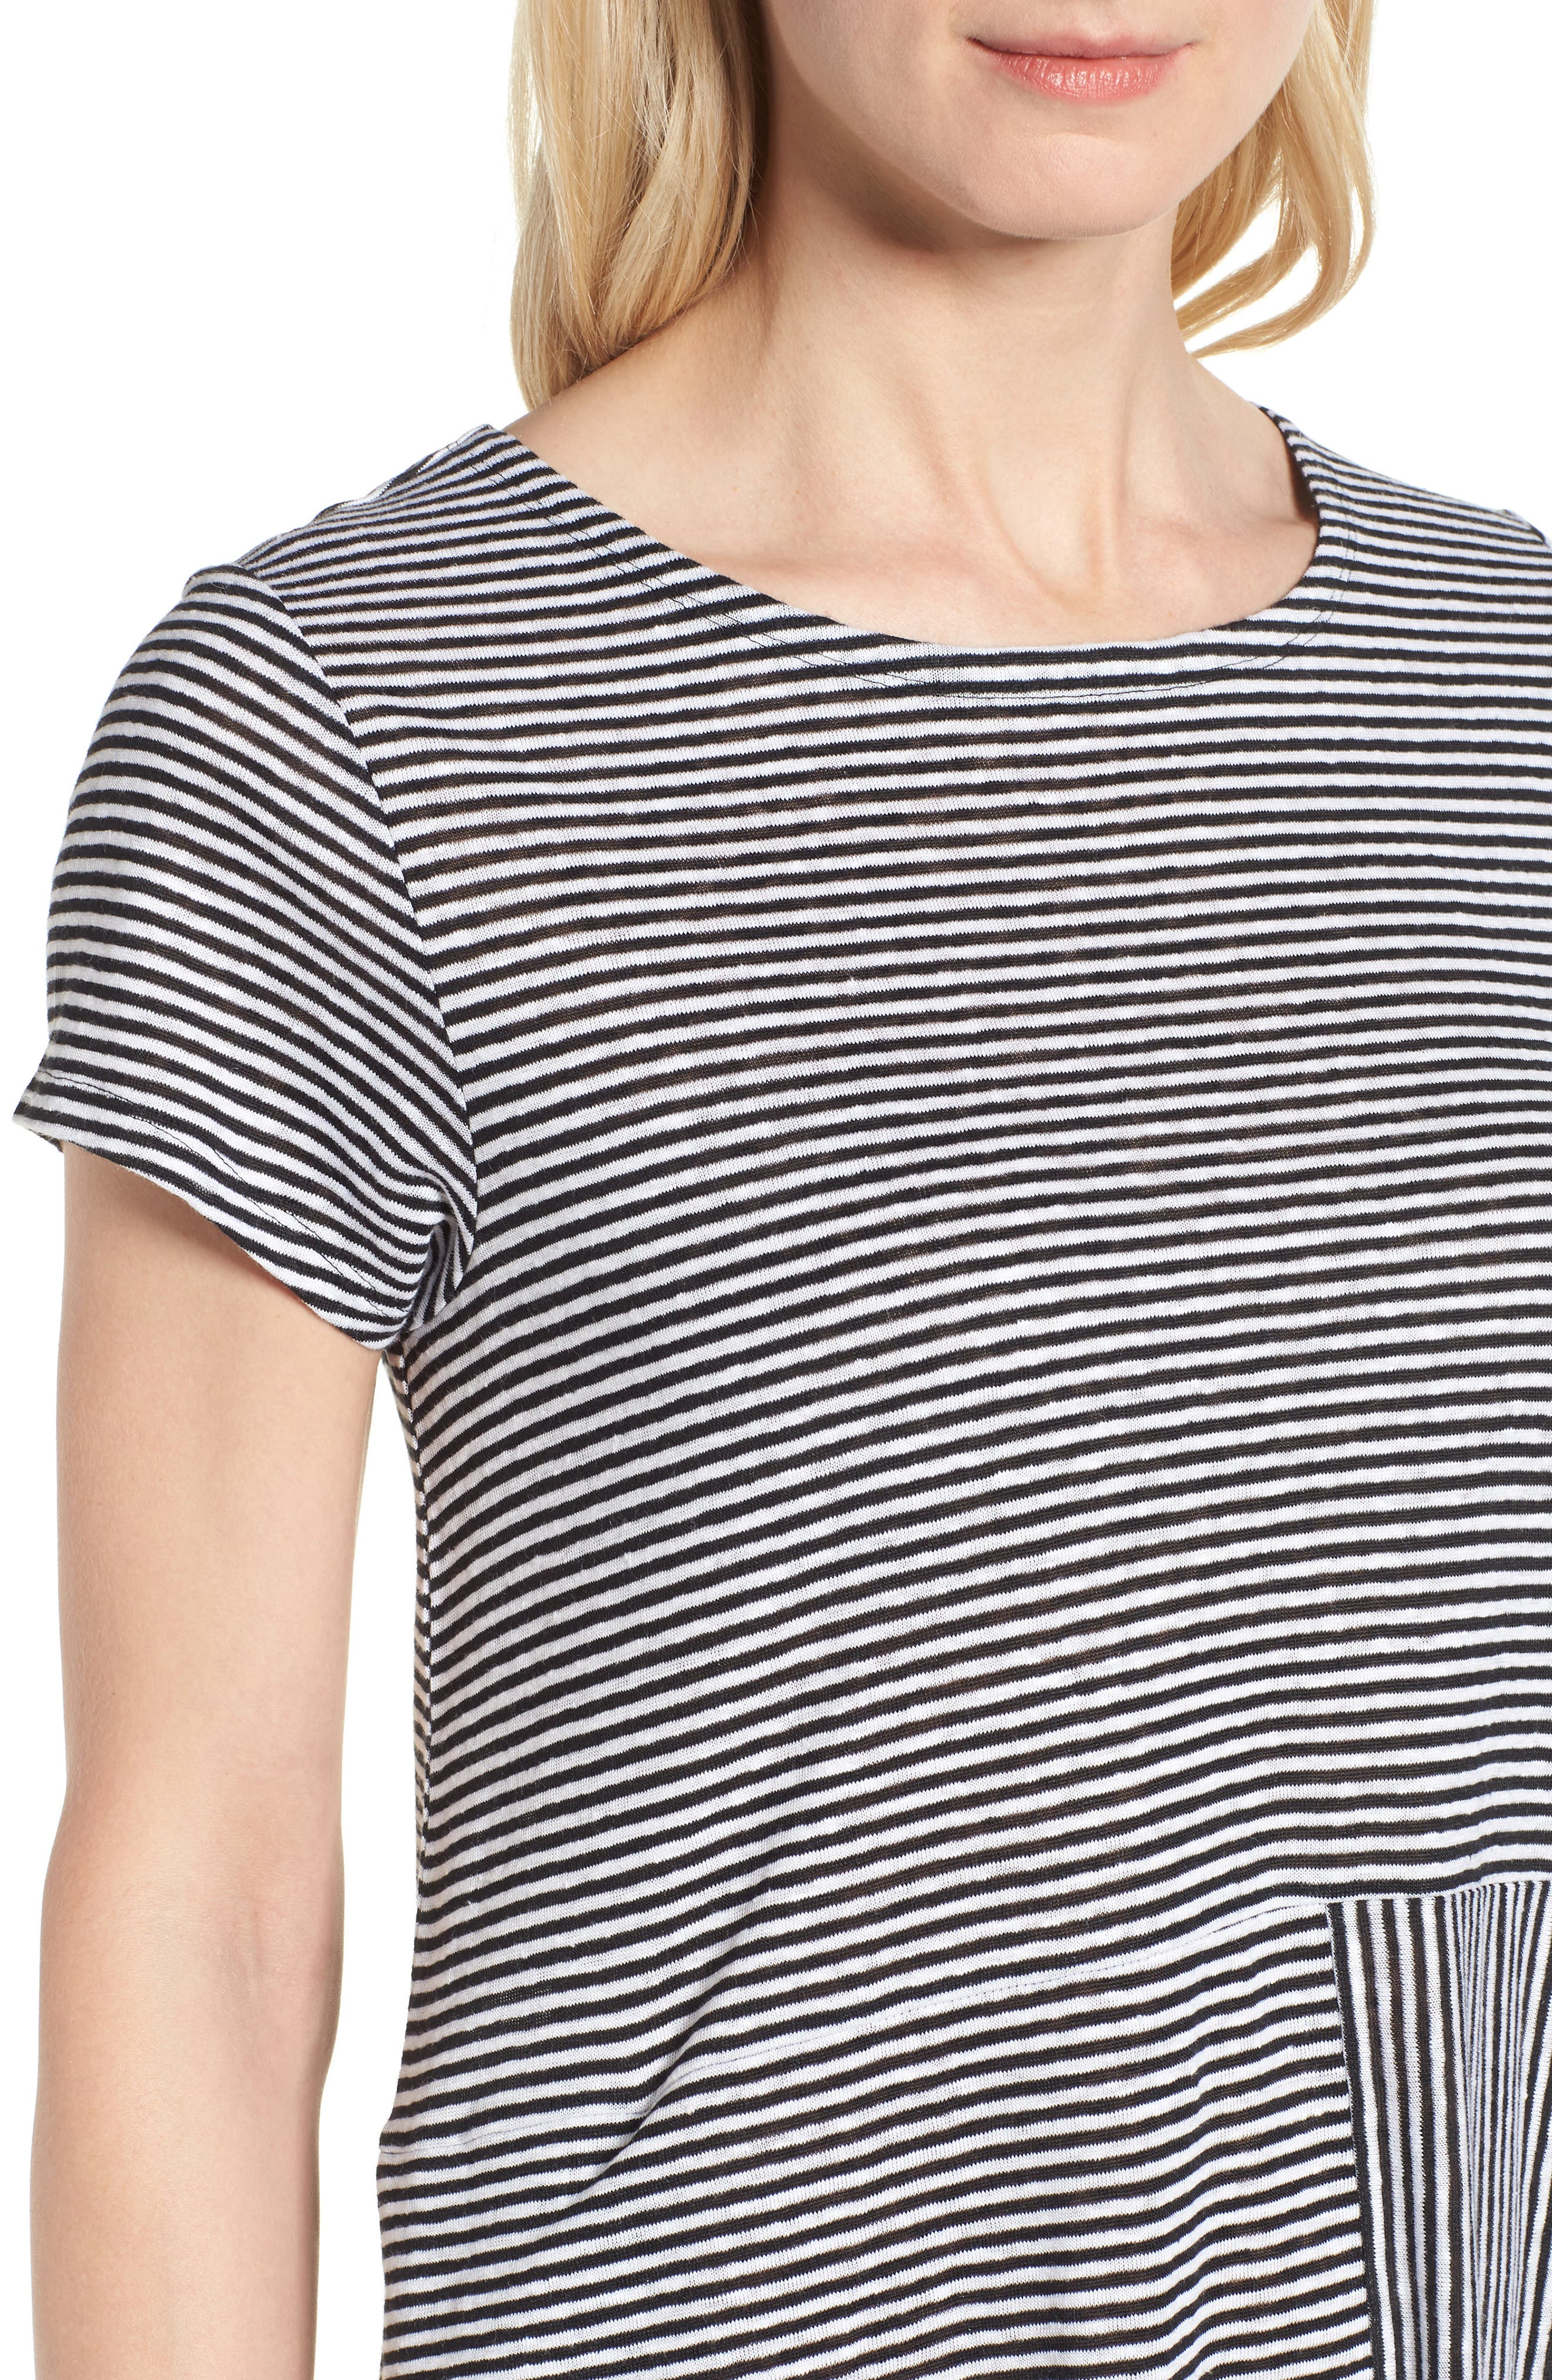 Stripe Organic Linen Jersey Shift Dress,                             Alternate thumbnail 4, color,                             Black/ White